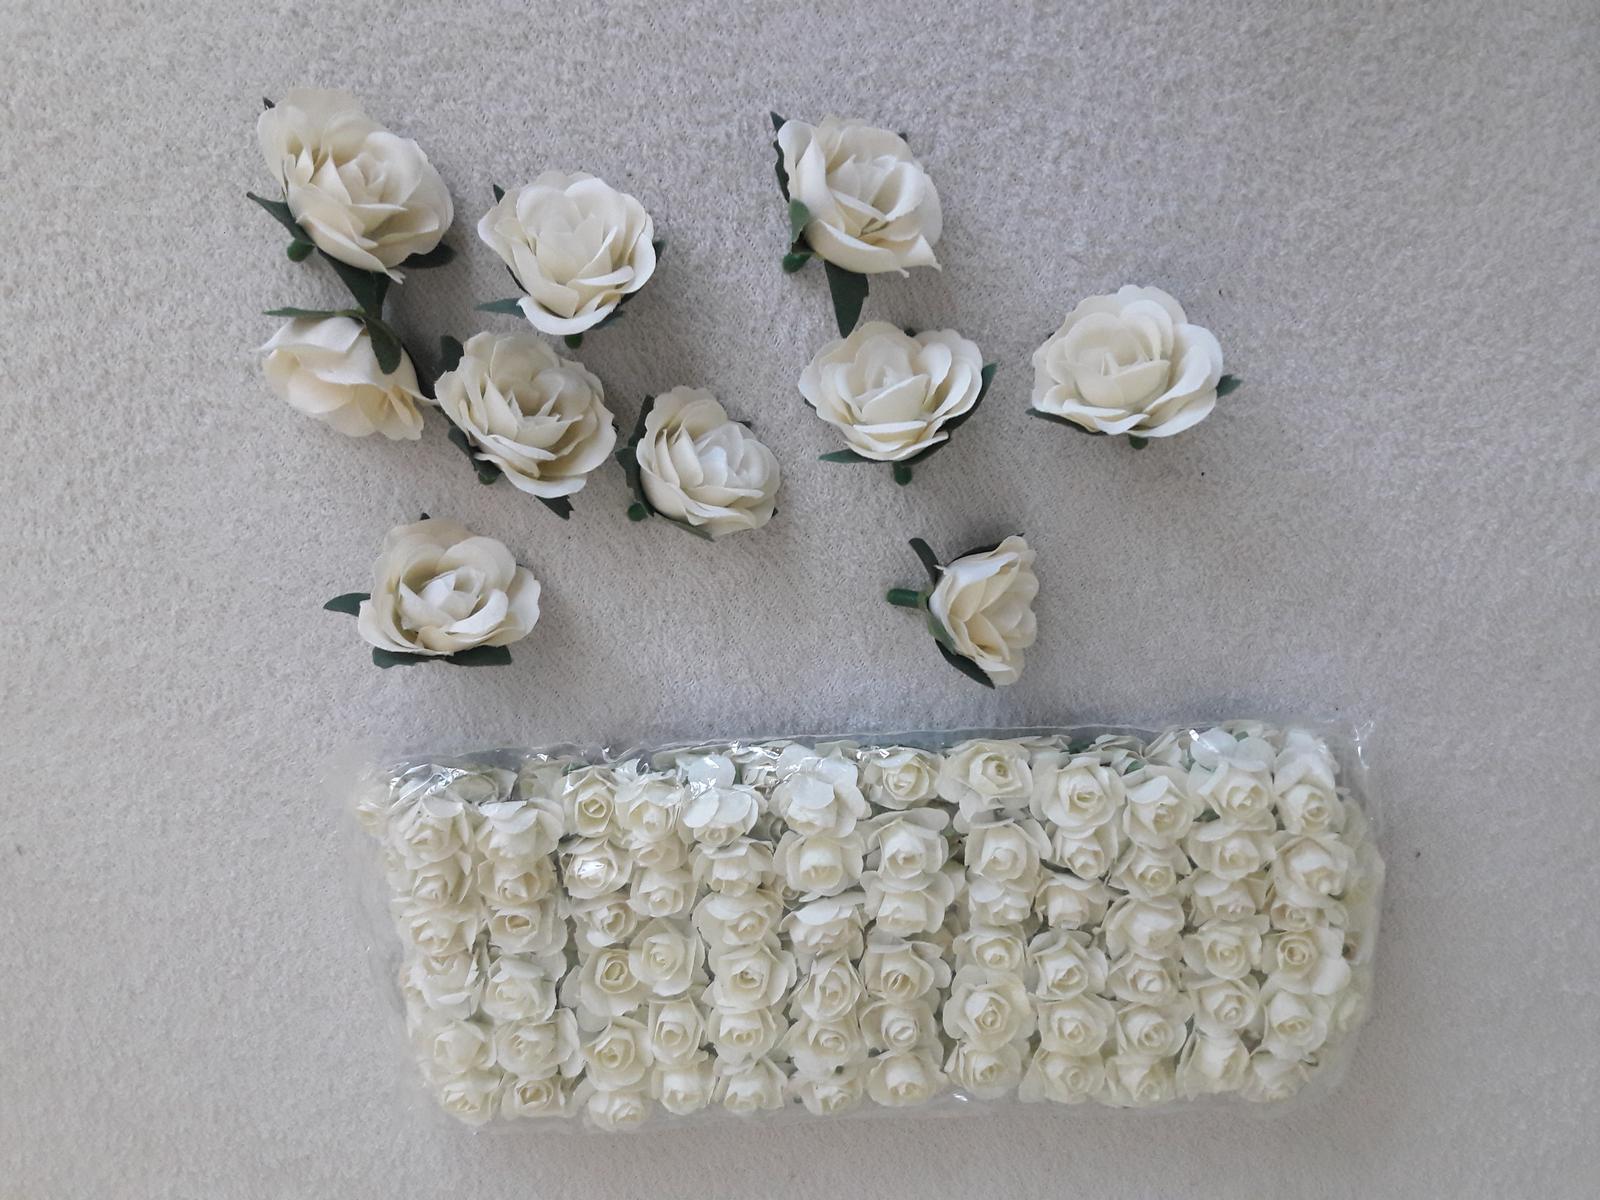 Růžičky na dekoraci - Obrázek č. 1